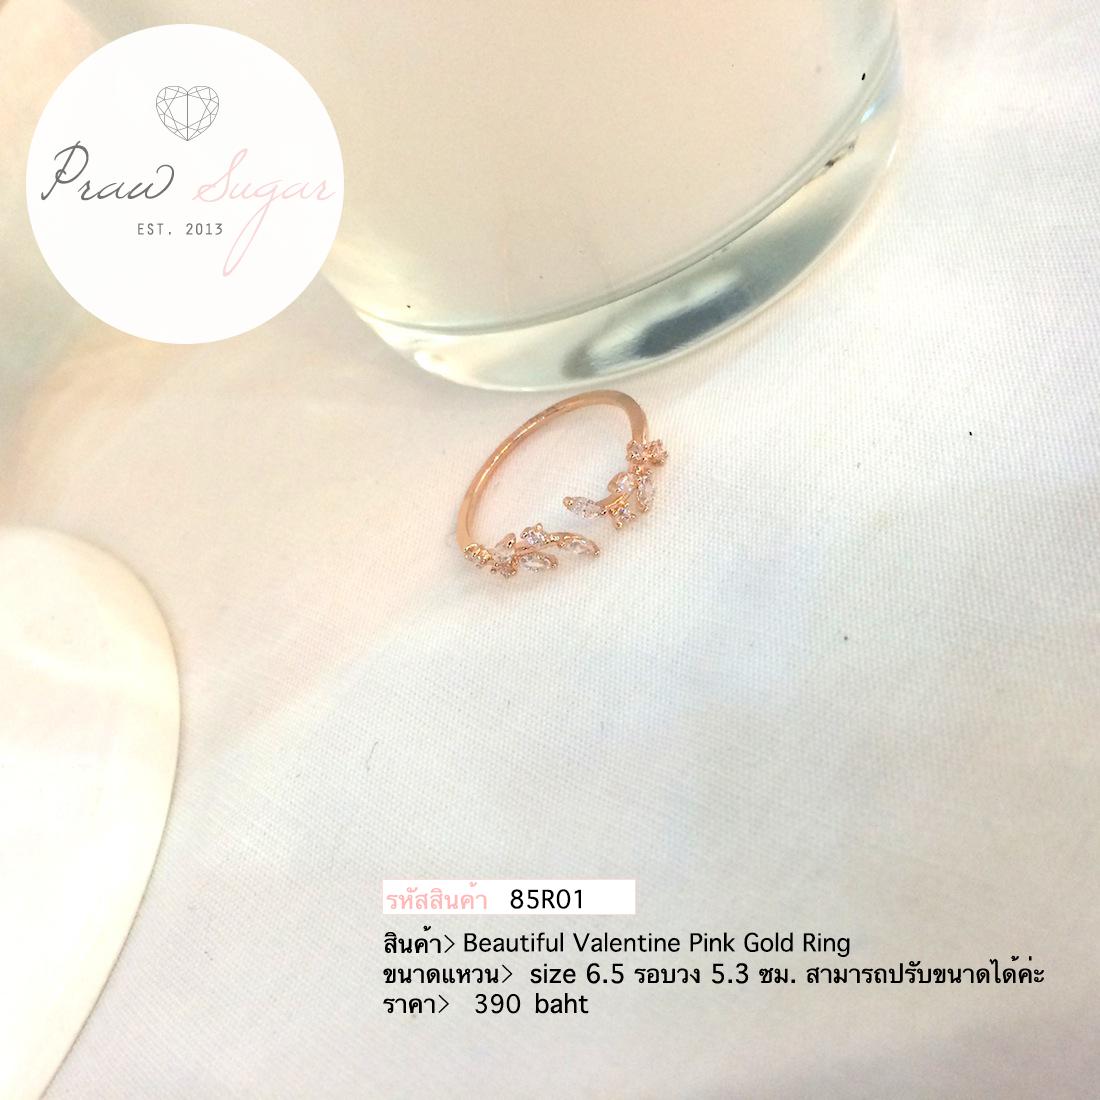 Beautiful Valentine Pink Gold Ring